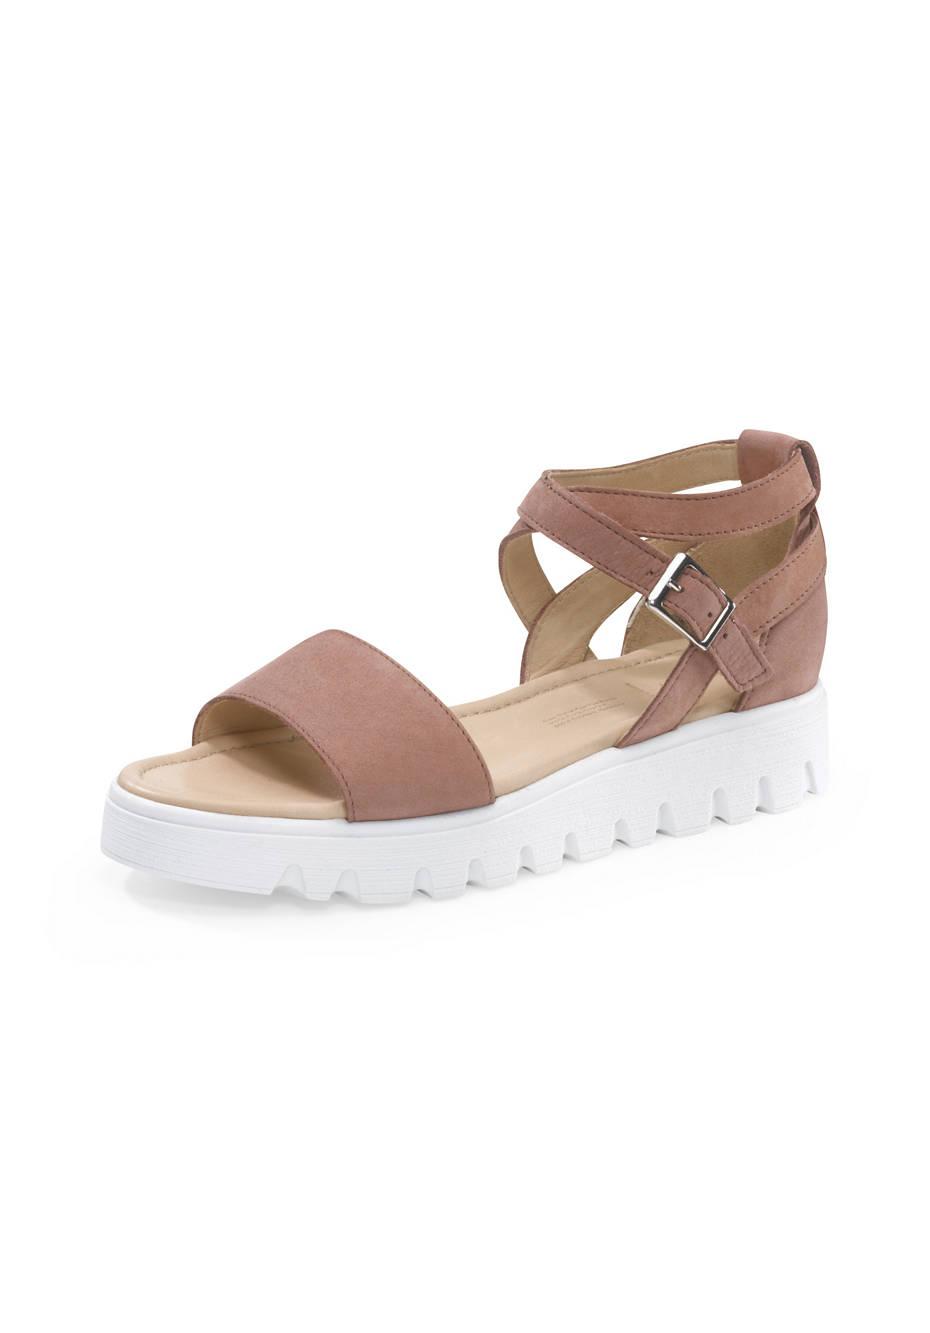 Damen Sandalette aus Nubukleder